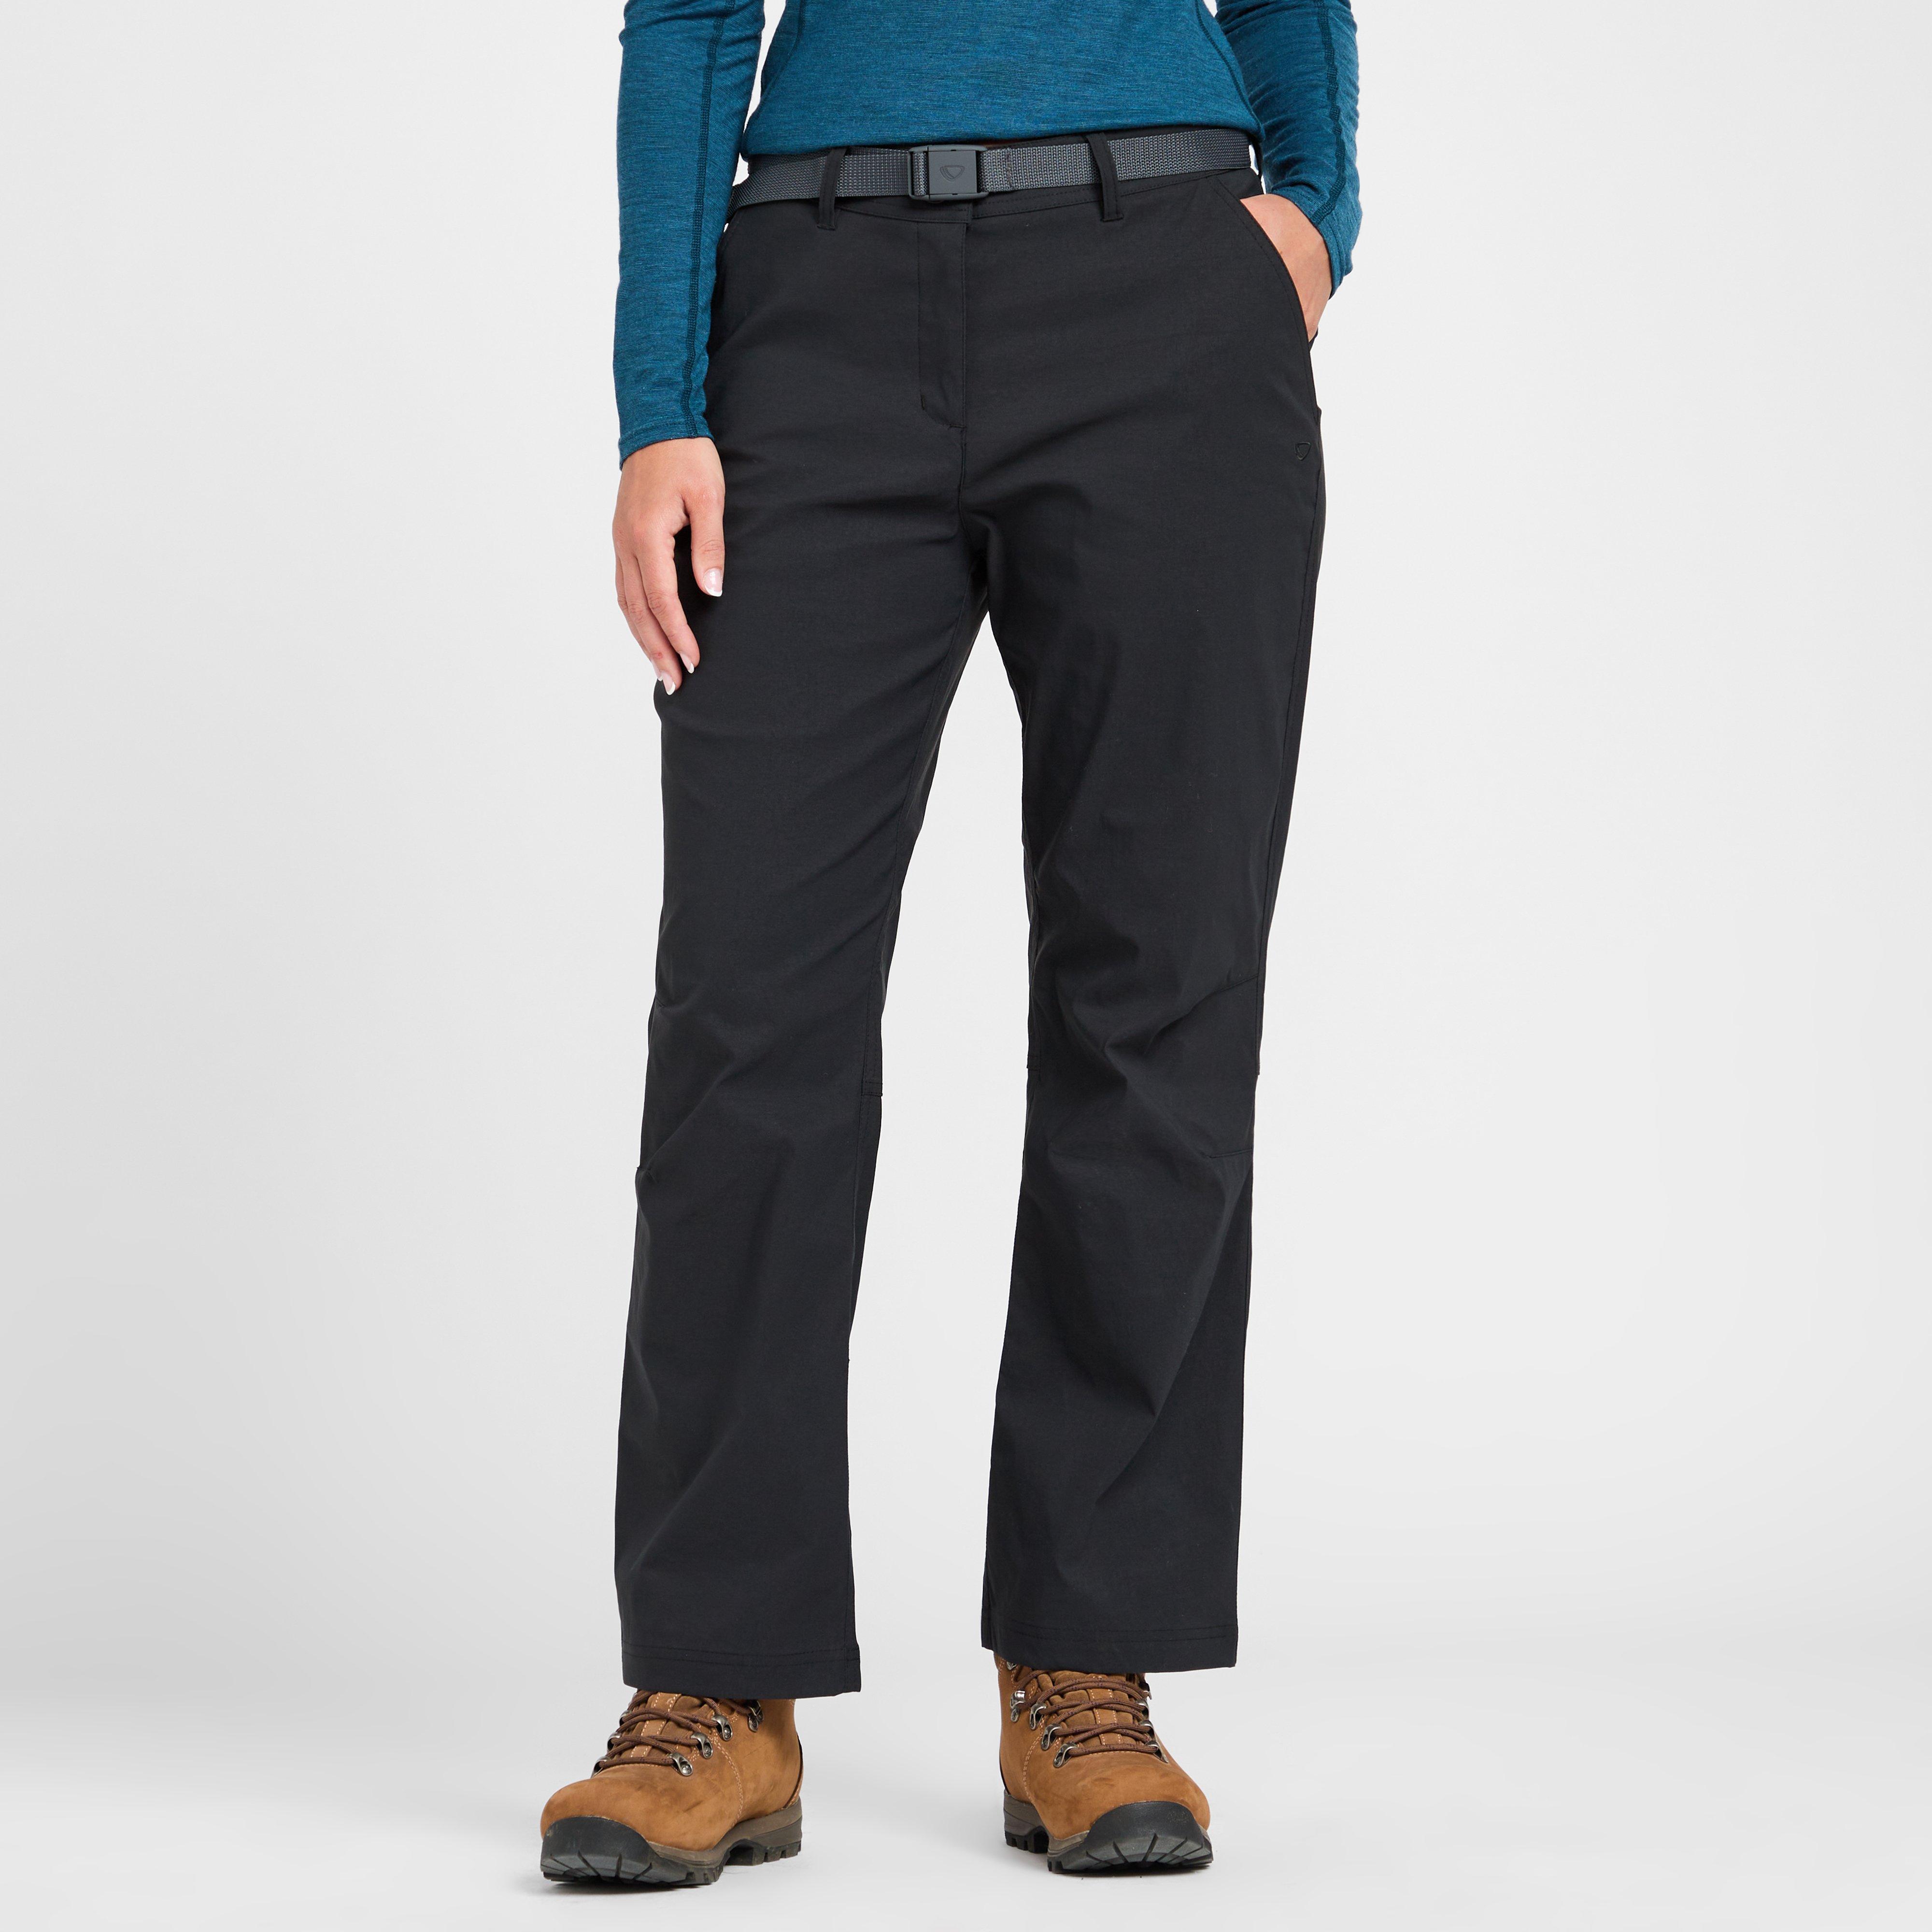 Brasher Womens Stretch Trousers - Black/blk  Black/blk